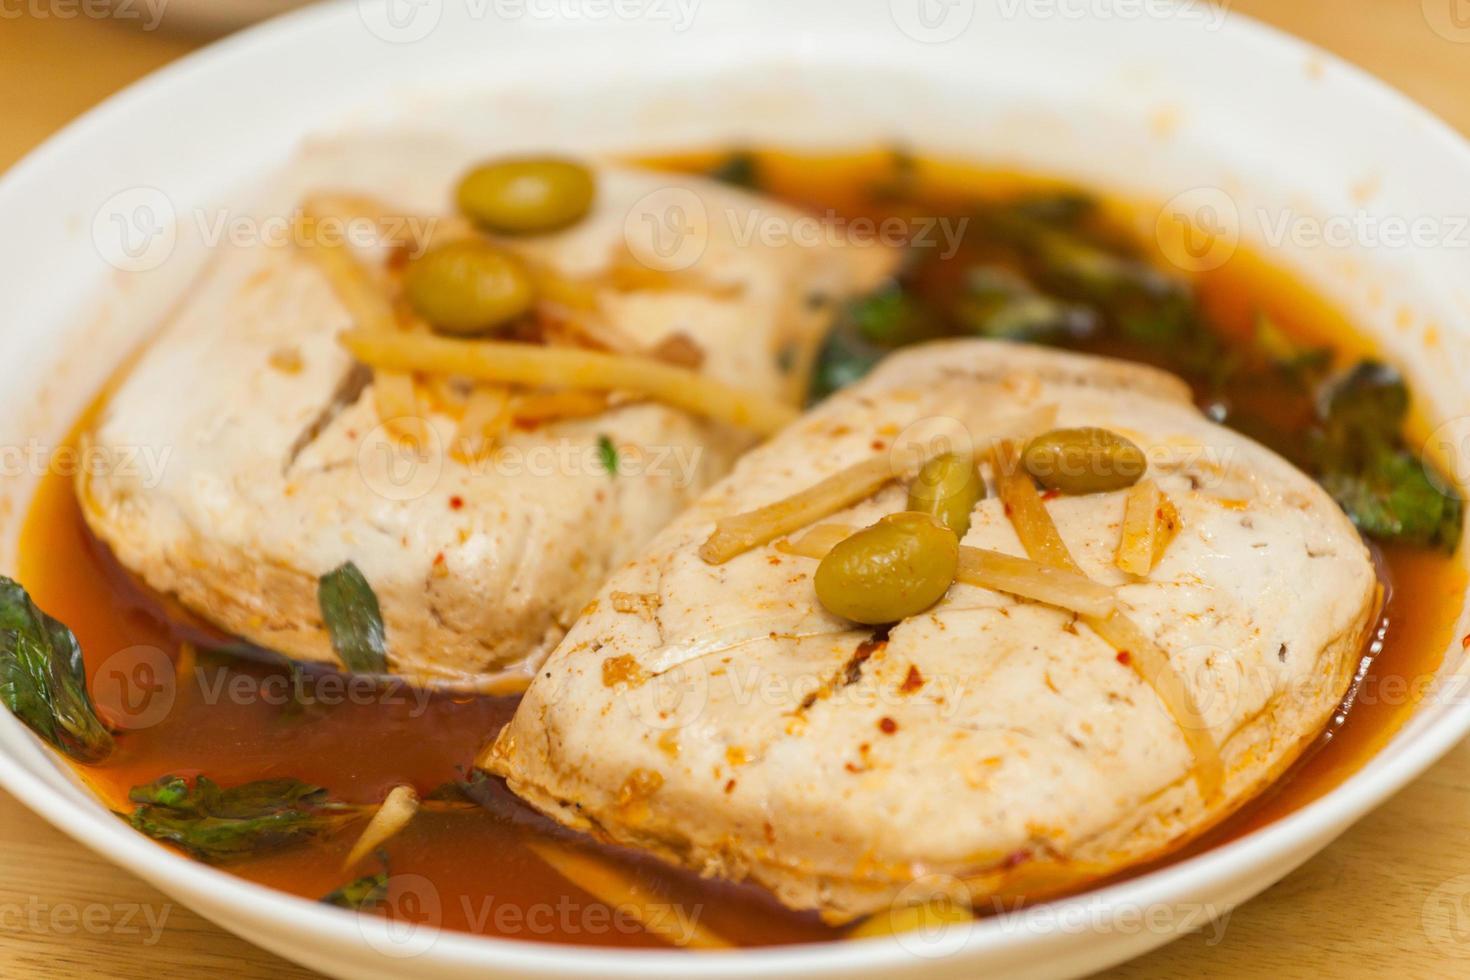 Stinky tofu(臭豆腐) photo